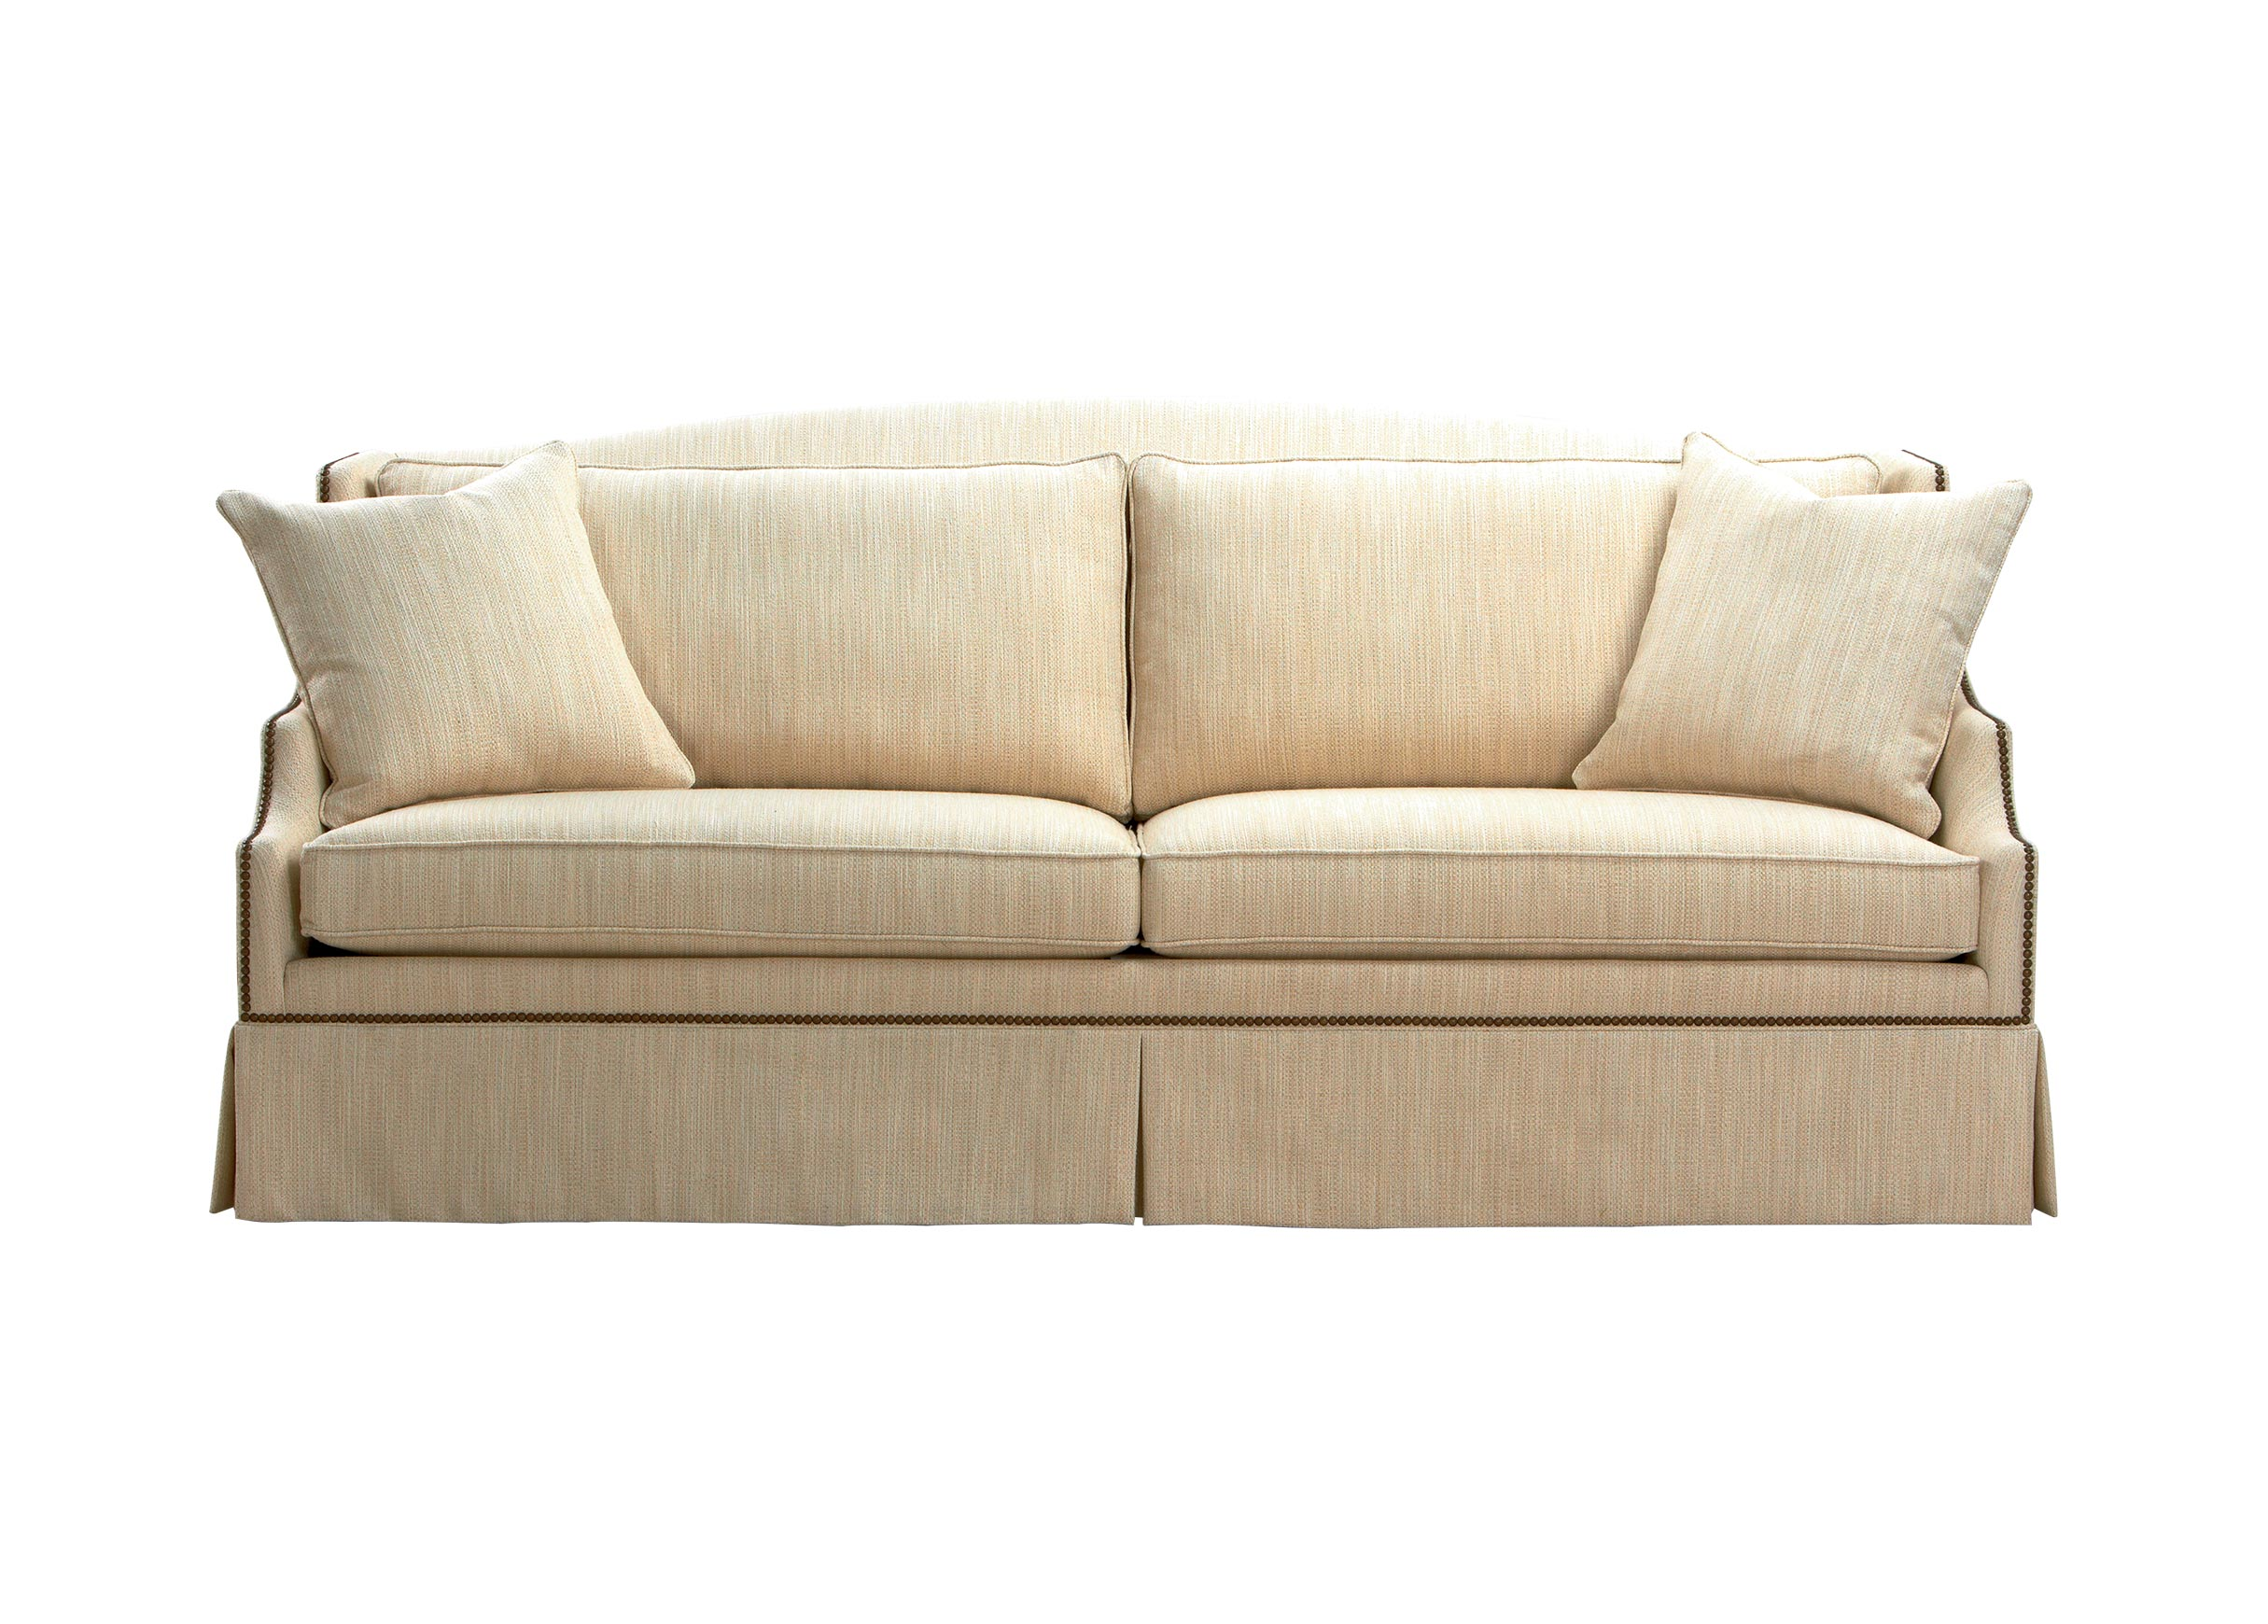 ethan allen sofas in living room | Phoebe Sofa | Sofas & Loveseats | Ethan Allen